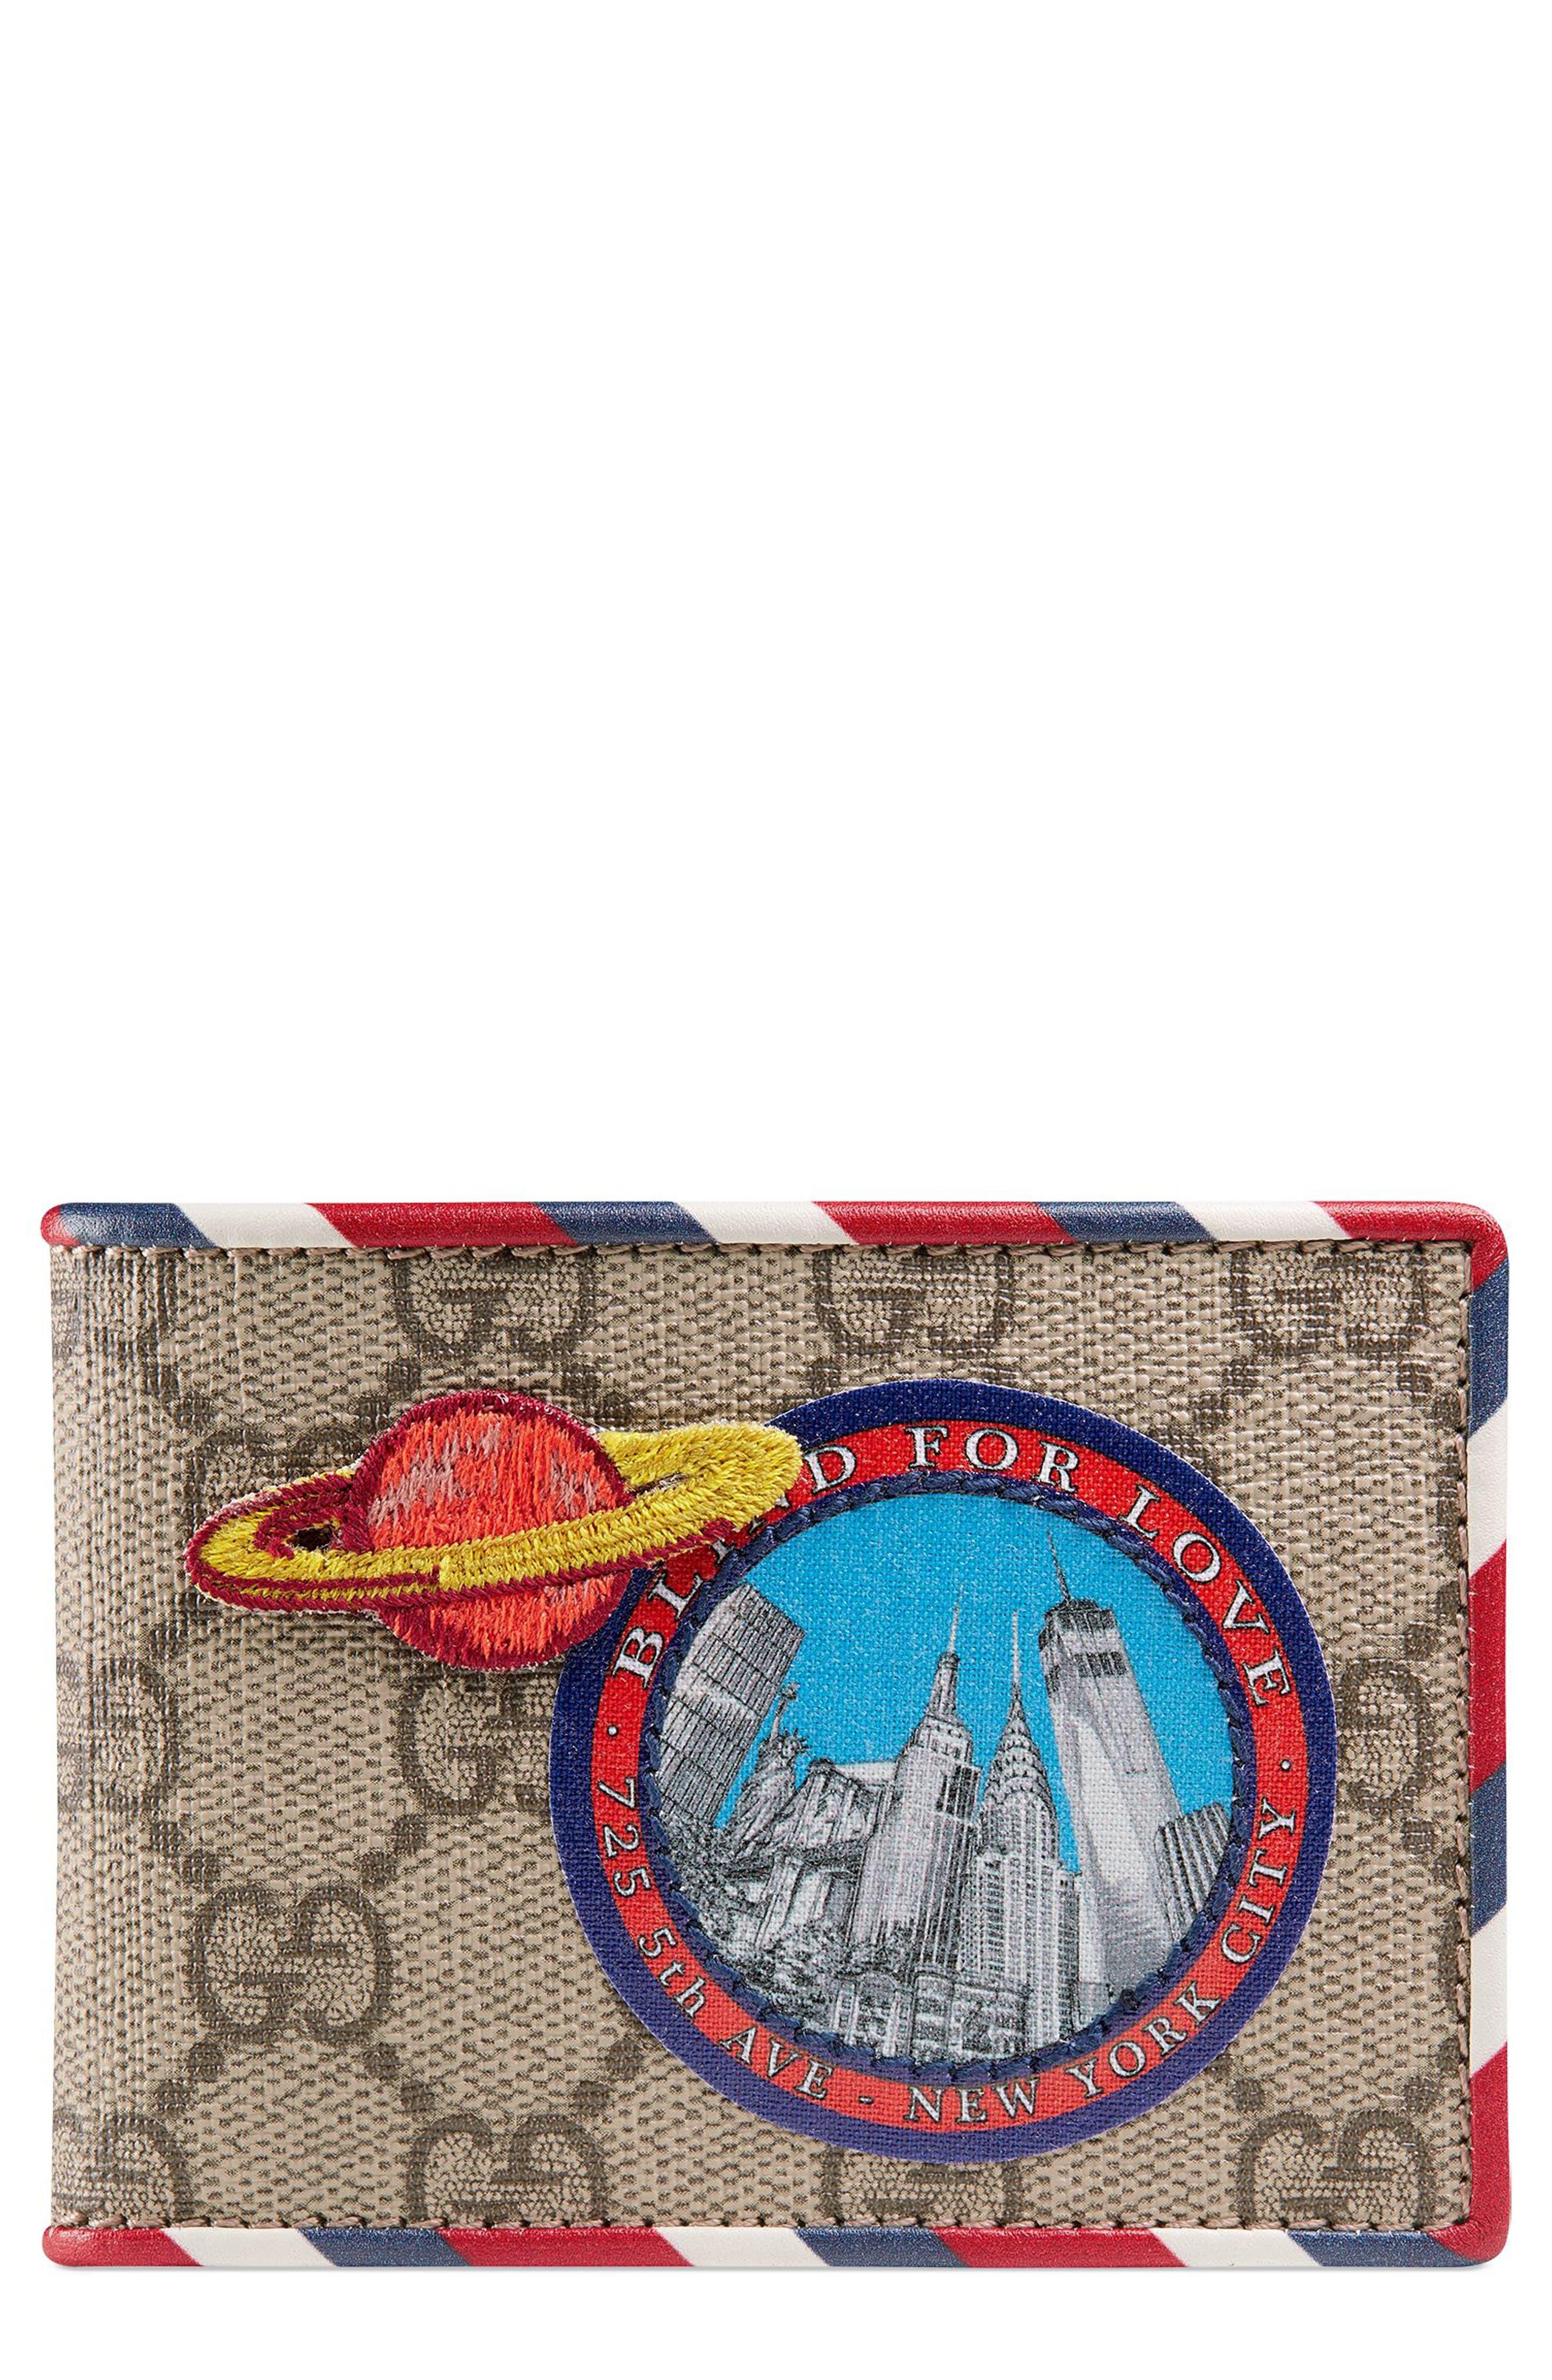 Gucci GG Supreme Patch Canvas Wallet